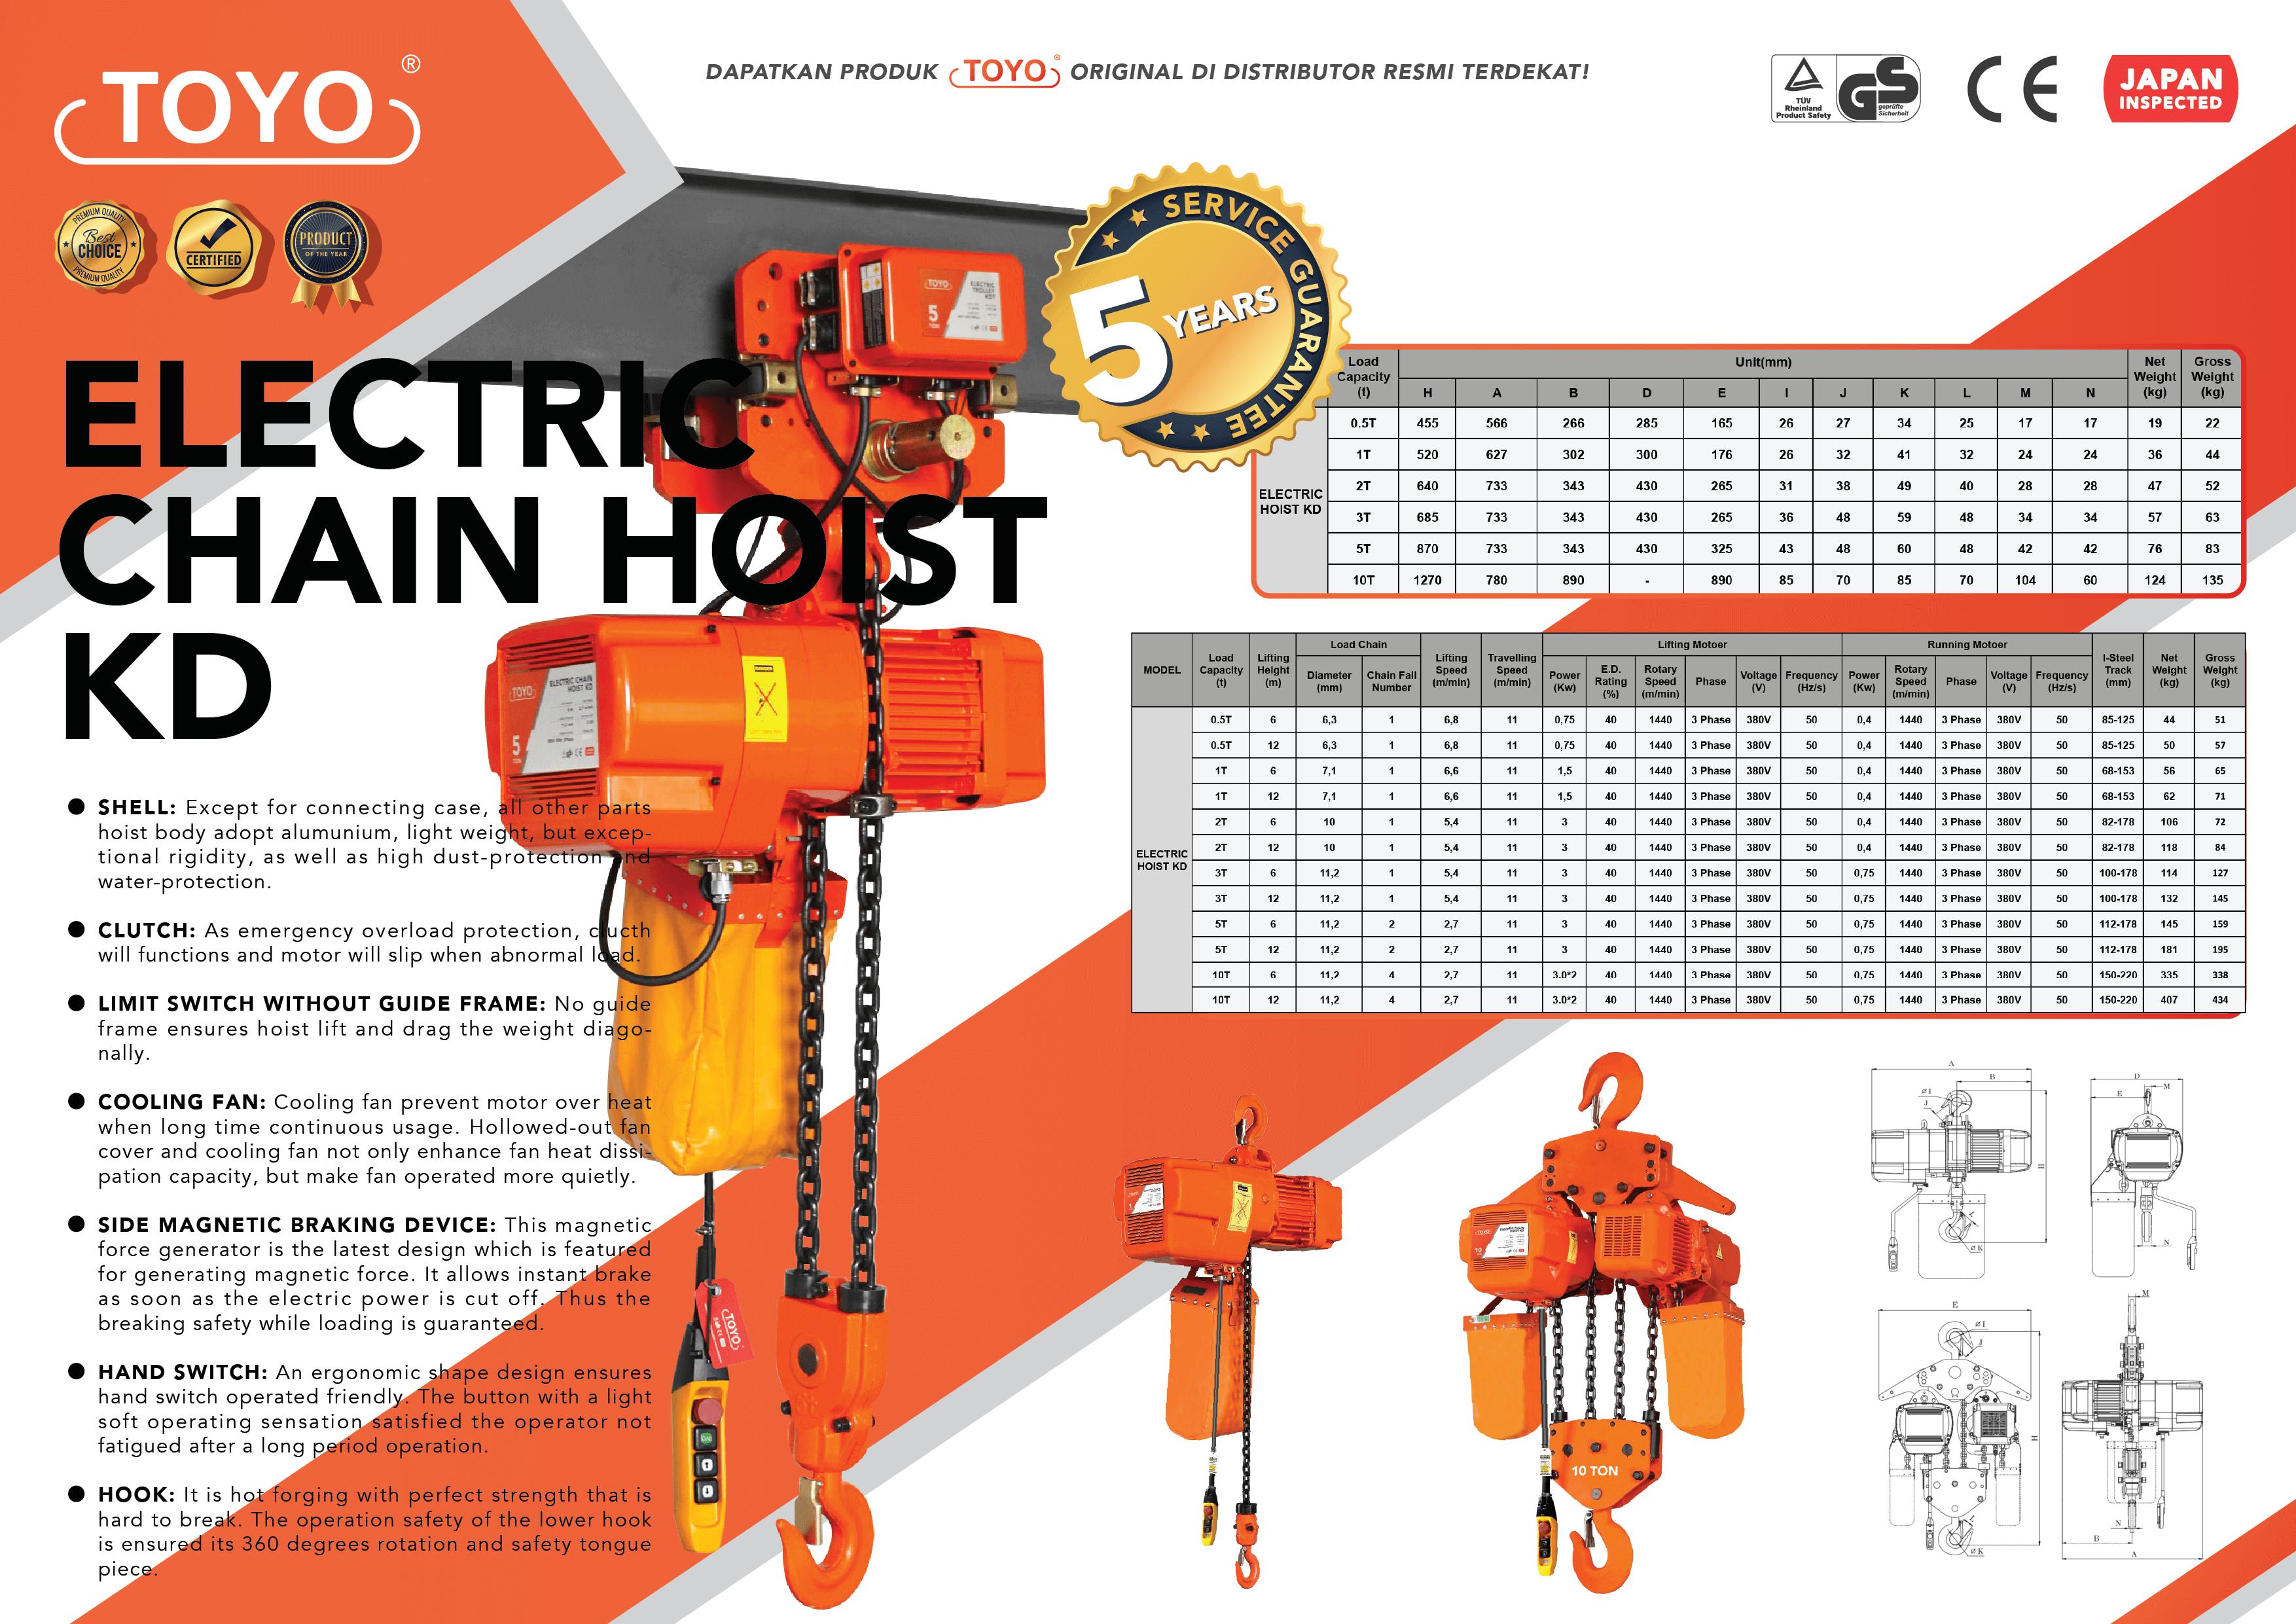 Spesifikasi Detail Electric Chain Hoist KD Series Toyo Original